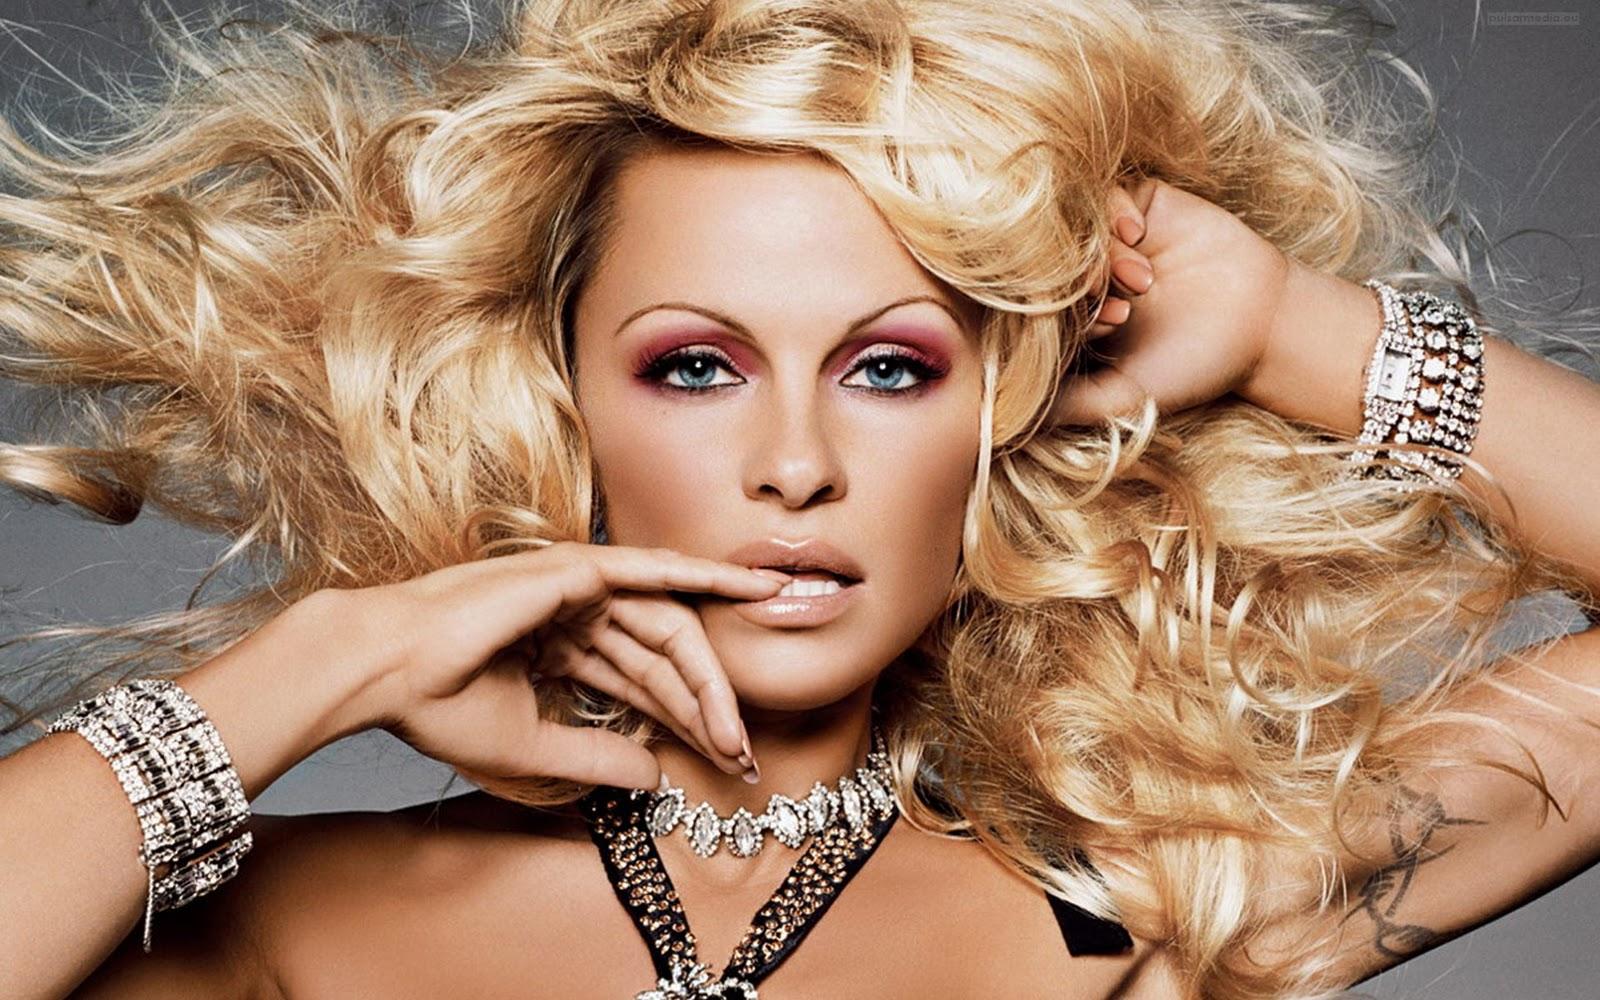 Celebrity Shine: Hot Hollywood Actress Pamela Anderson